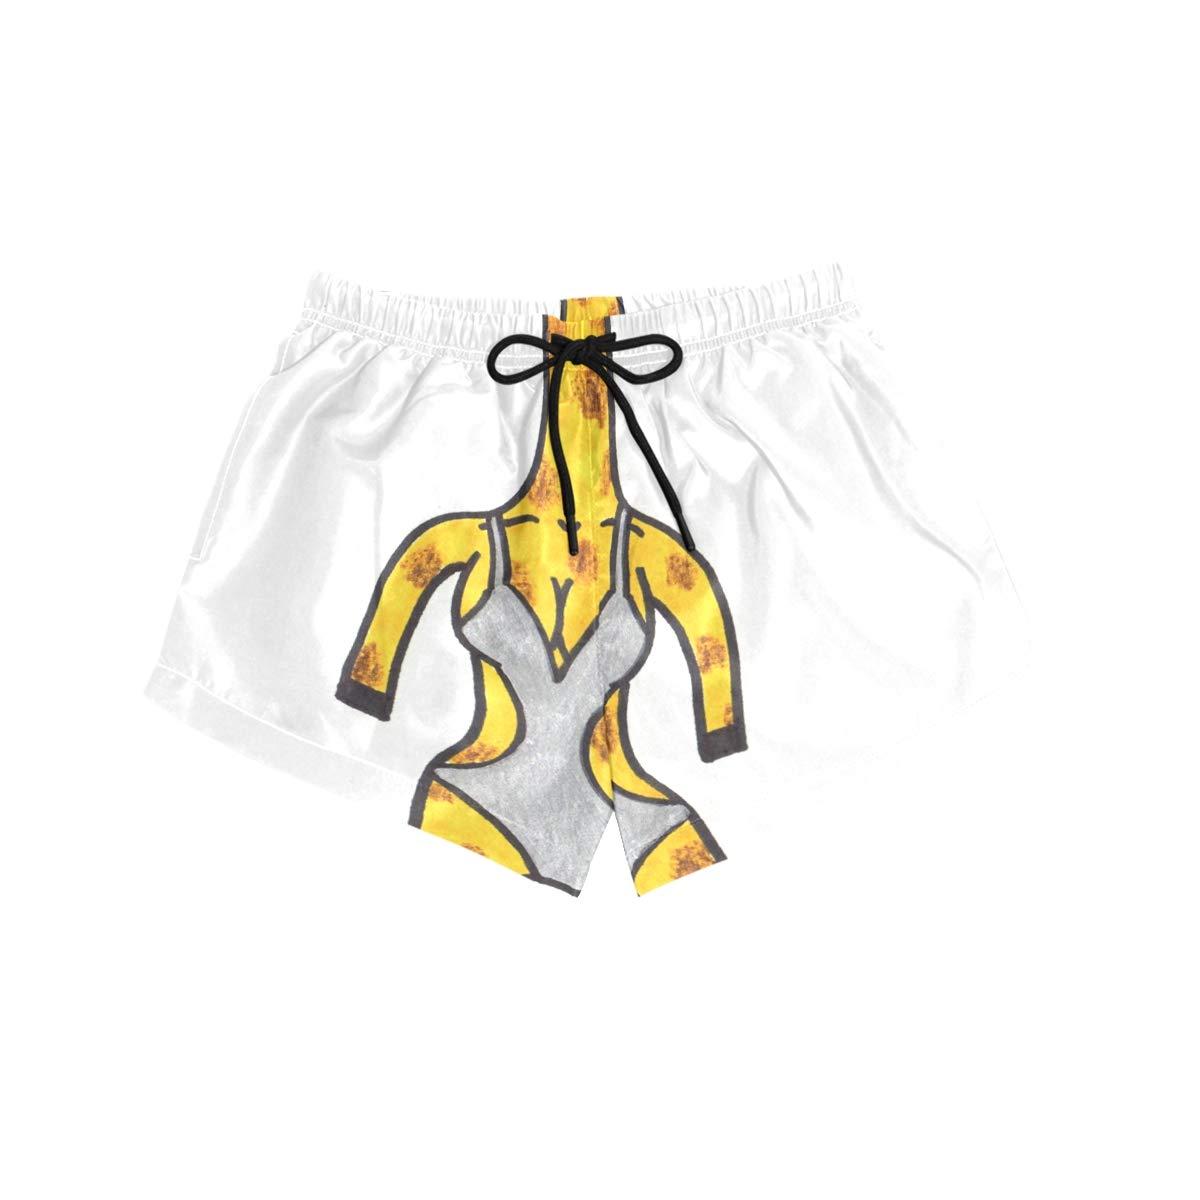 NWTSPY Giraffe Bathing Suit Womens Sport Beach Swim Shorts Board Shorts Swimsuit with Mesh Lining